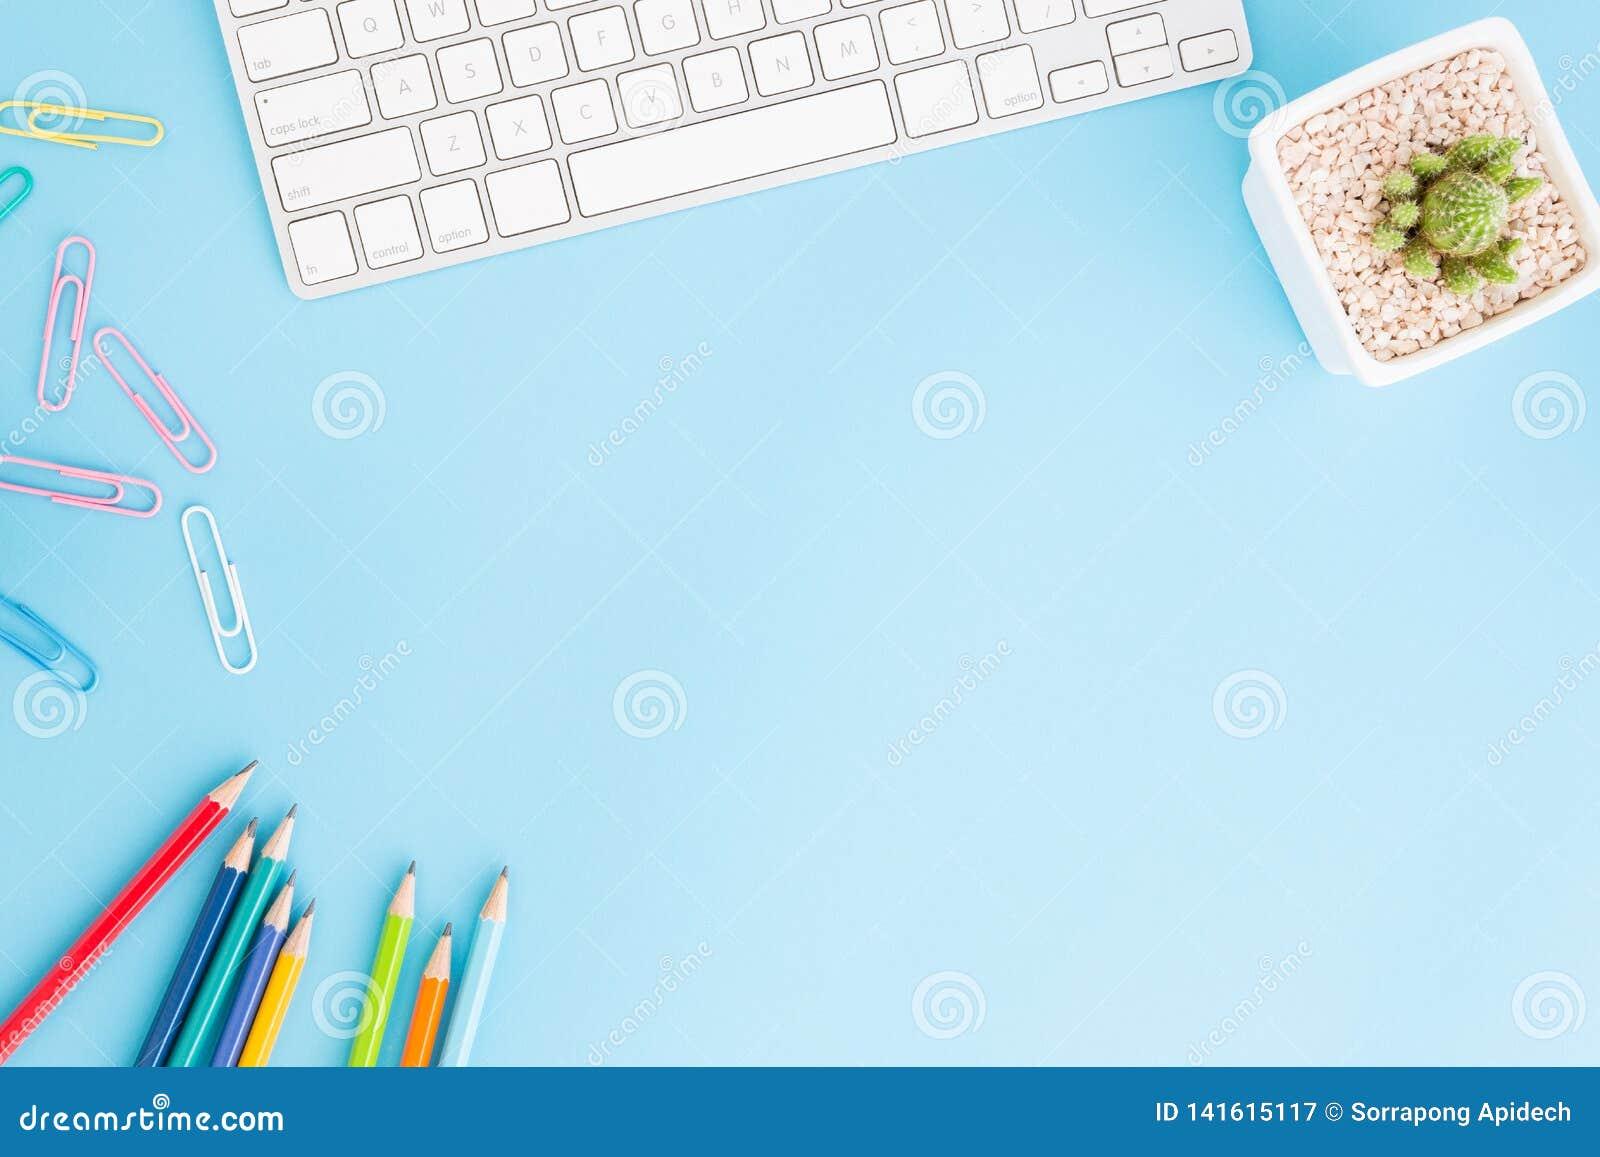 Vlak leg foto van bureau met potlood en toetsenbord, Hoogste mening workpace over blauwe achtergrond en exemplaarruimte